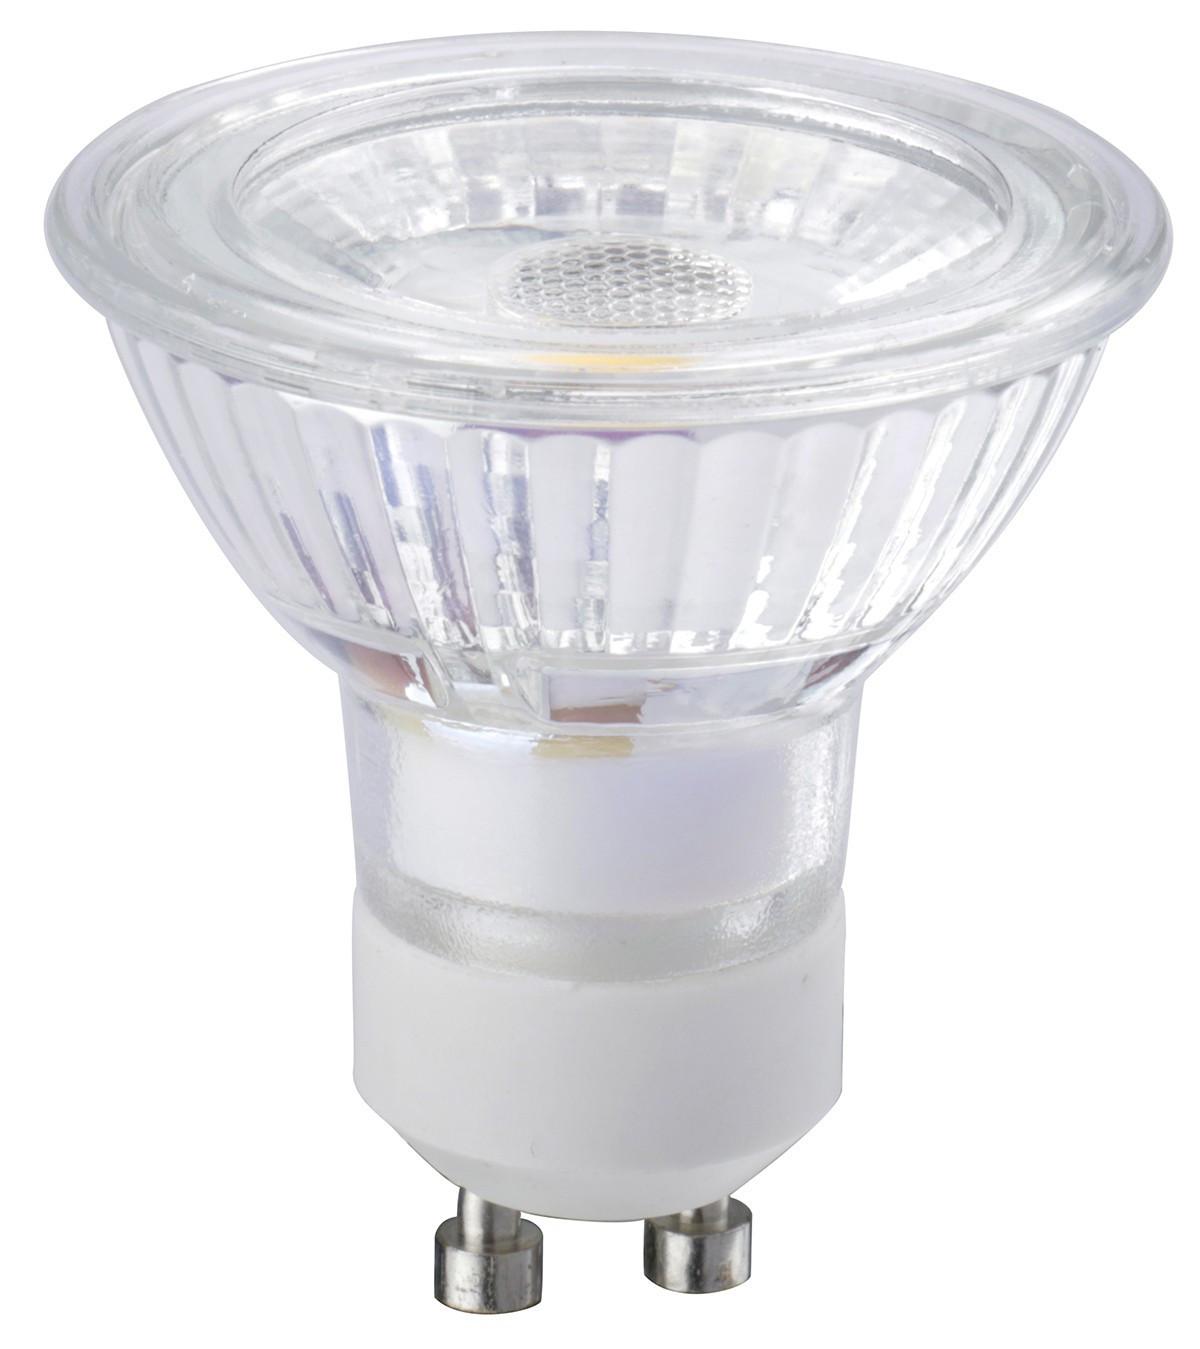 LANDLITE LED-GU10-5W/COB melegfehér(2700K), LED izzó